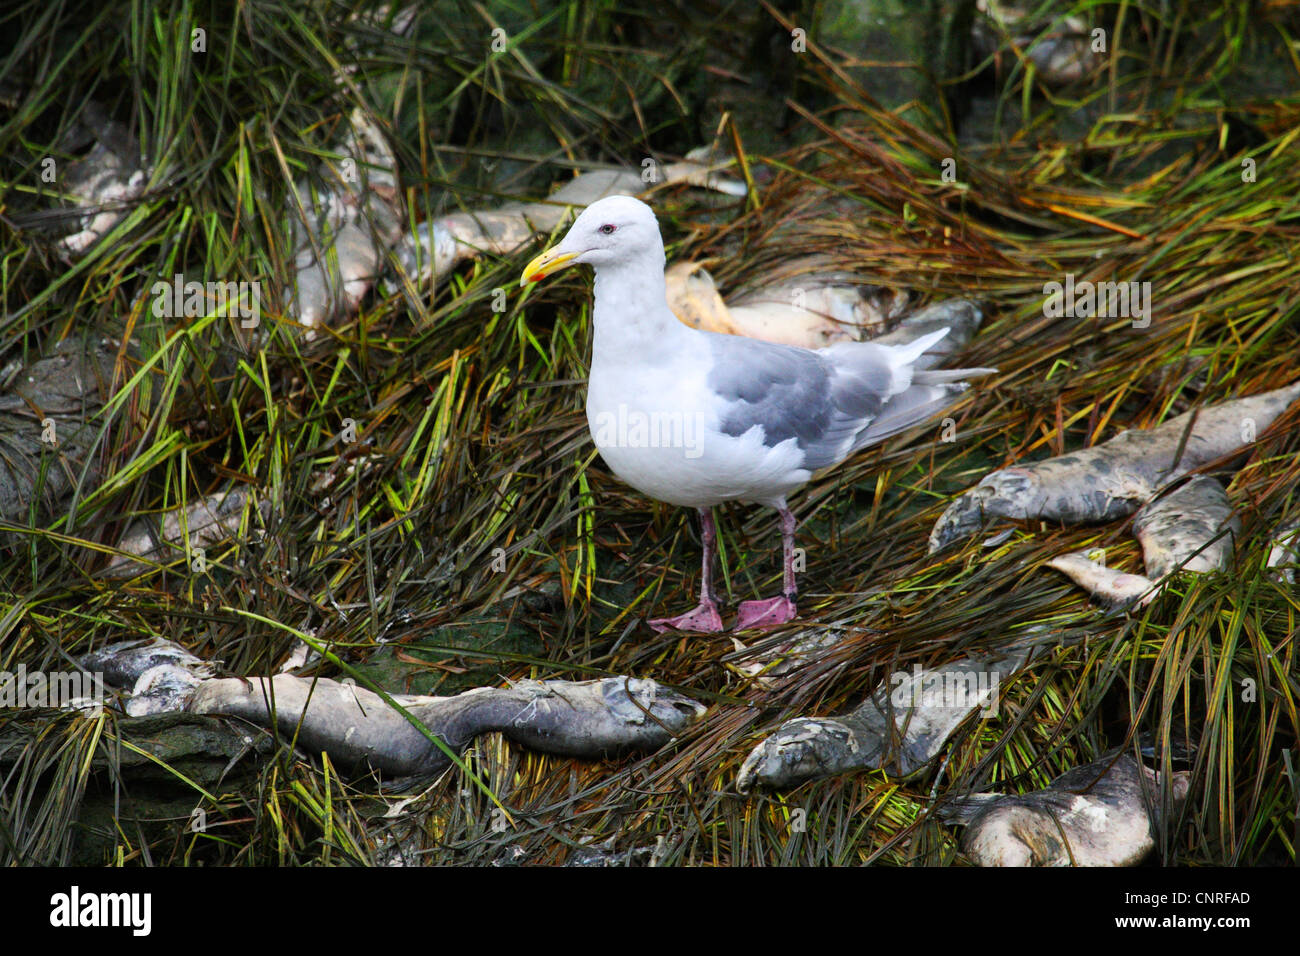 glaucous-winged gull (Larus glaucescens), feeding on salman, USA, Alaska - Stock Image